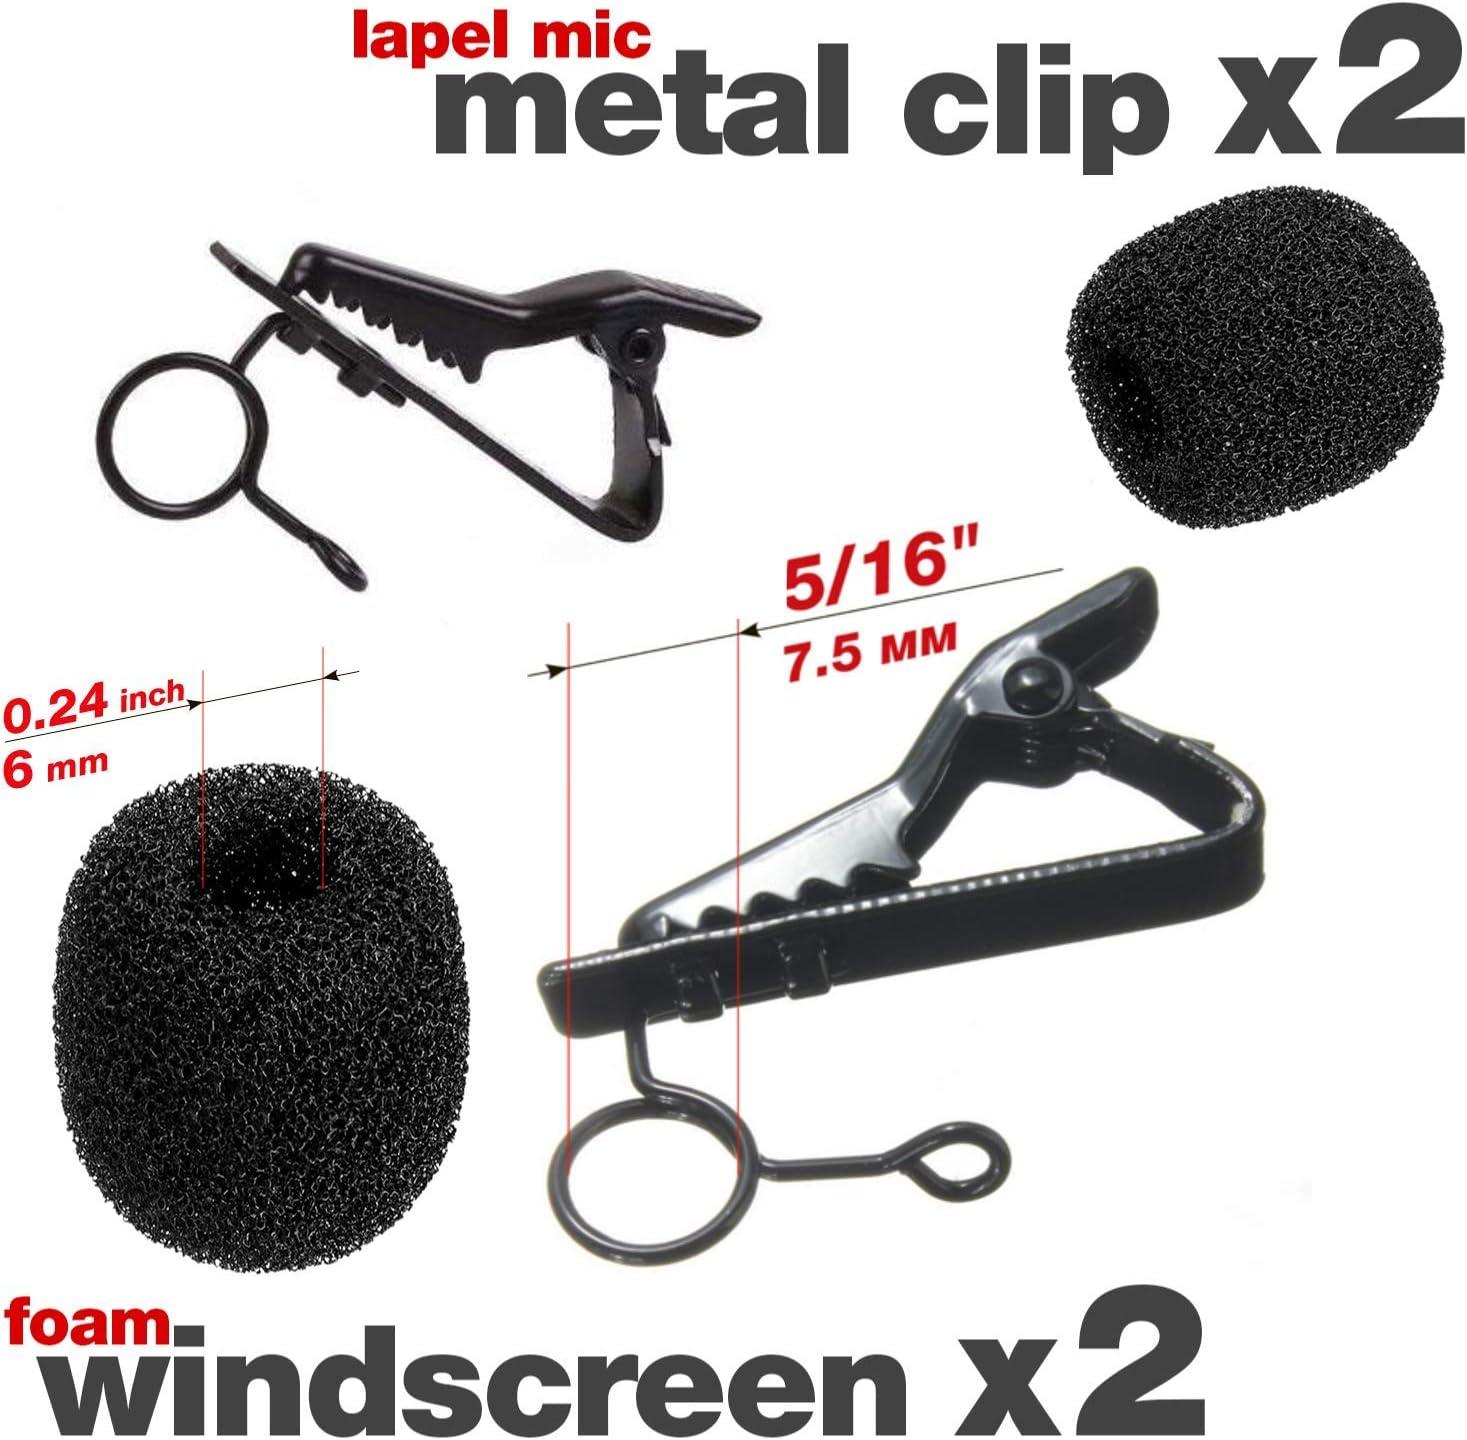 "2 Lapel Mic Clip 5/16"" + 2 Foam Windscreen Cover Lav Mic Clip Lavalier Microphone Clips 7189OaWUIhL"